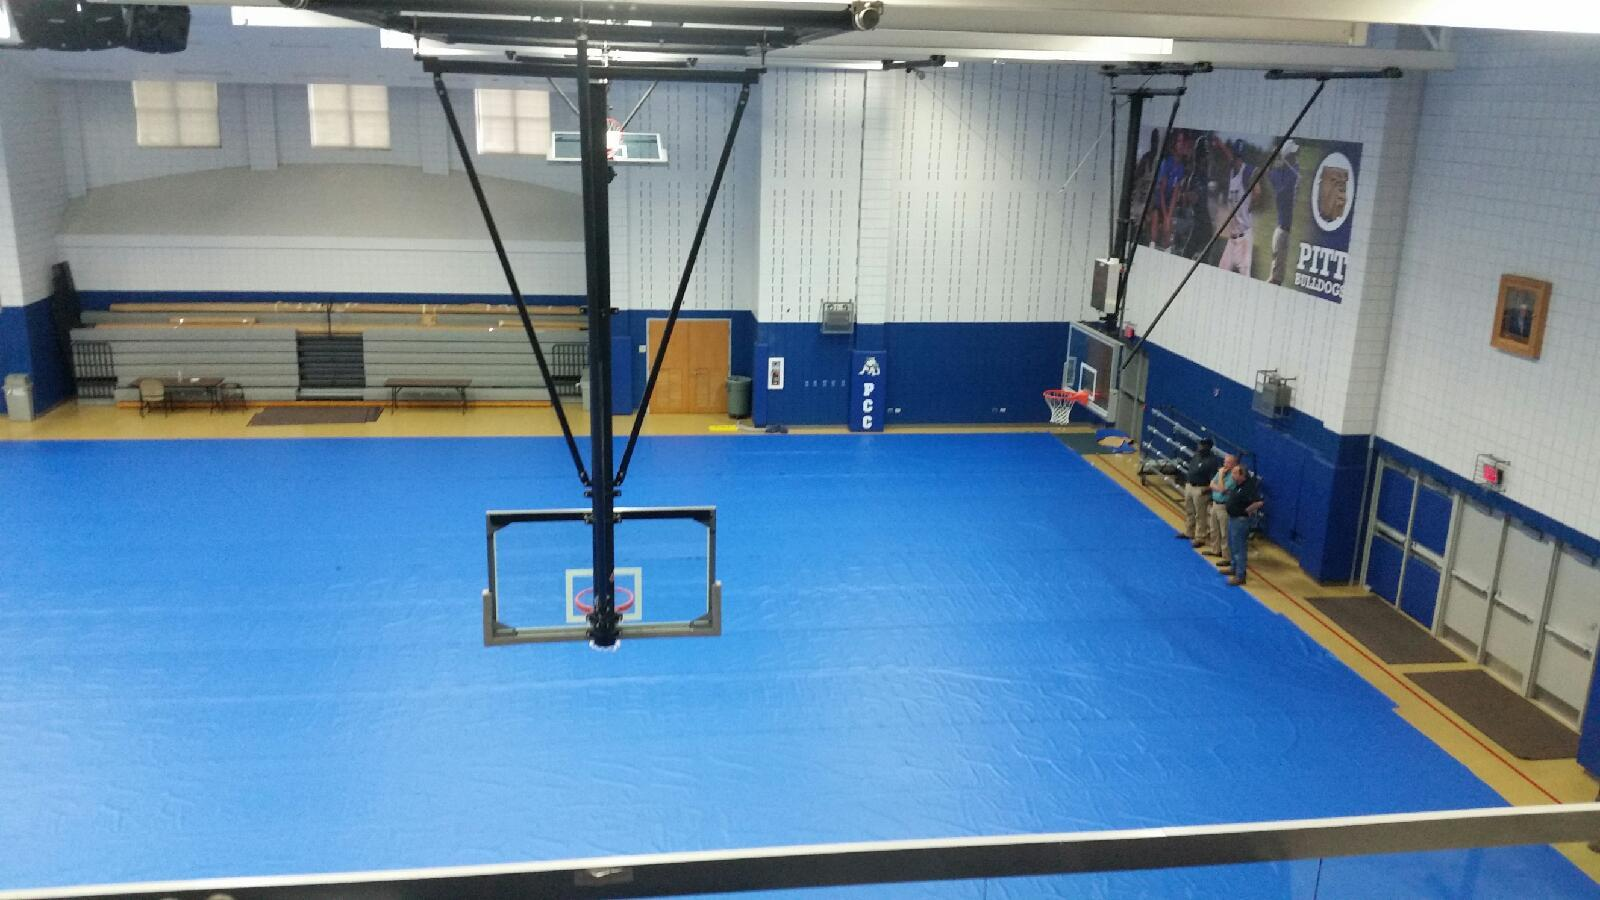 pitt-college-north-carolina-gym-floor-cover.jpg